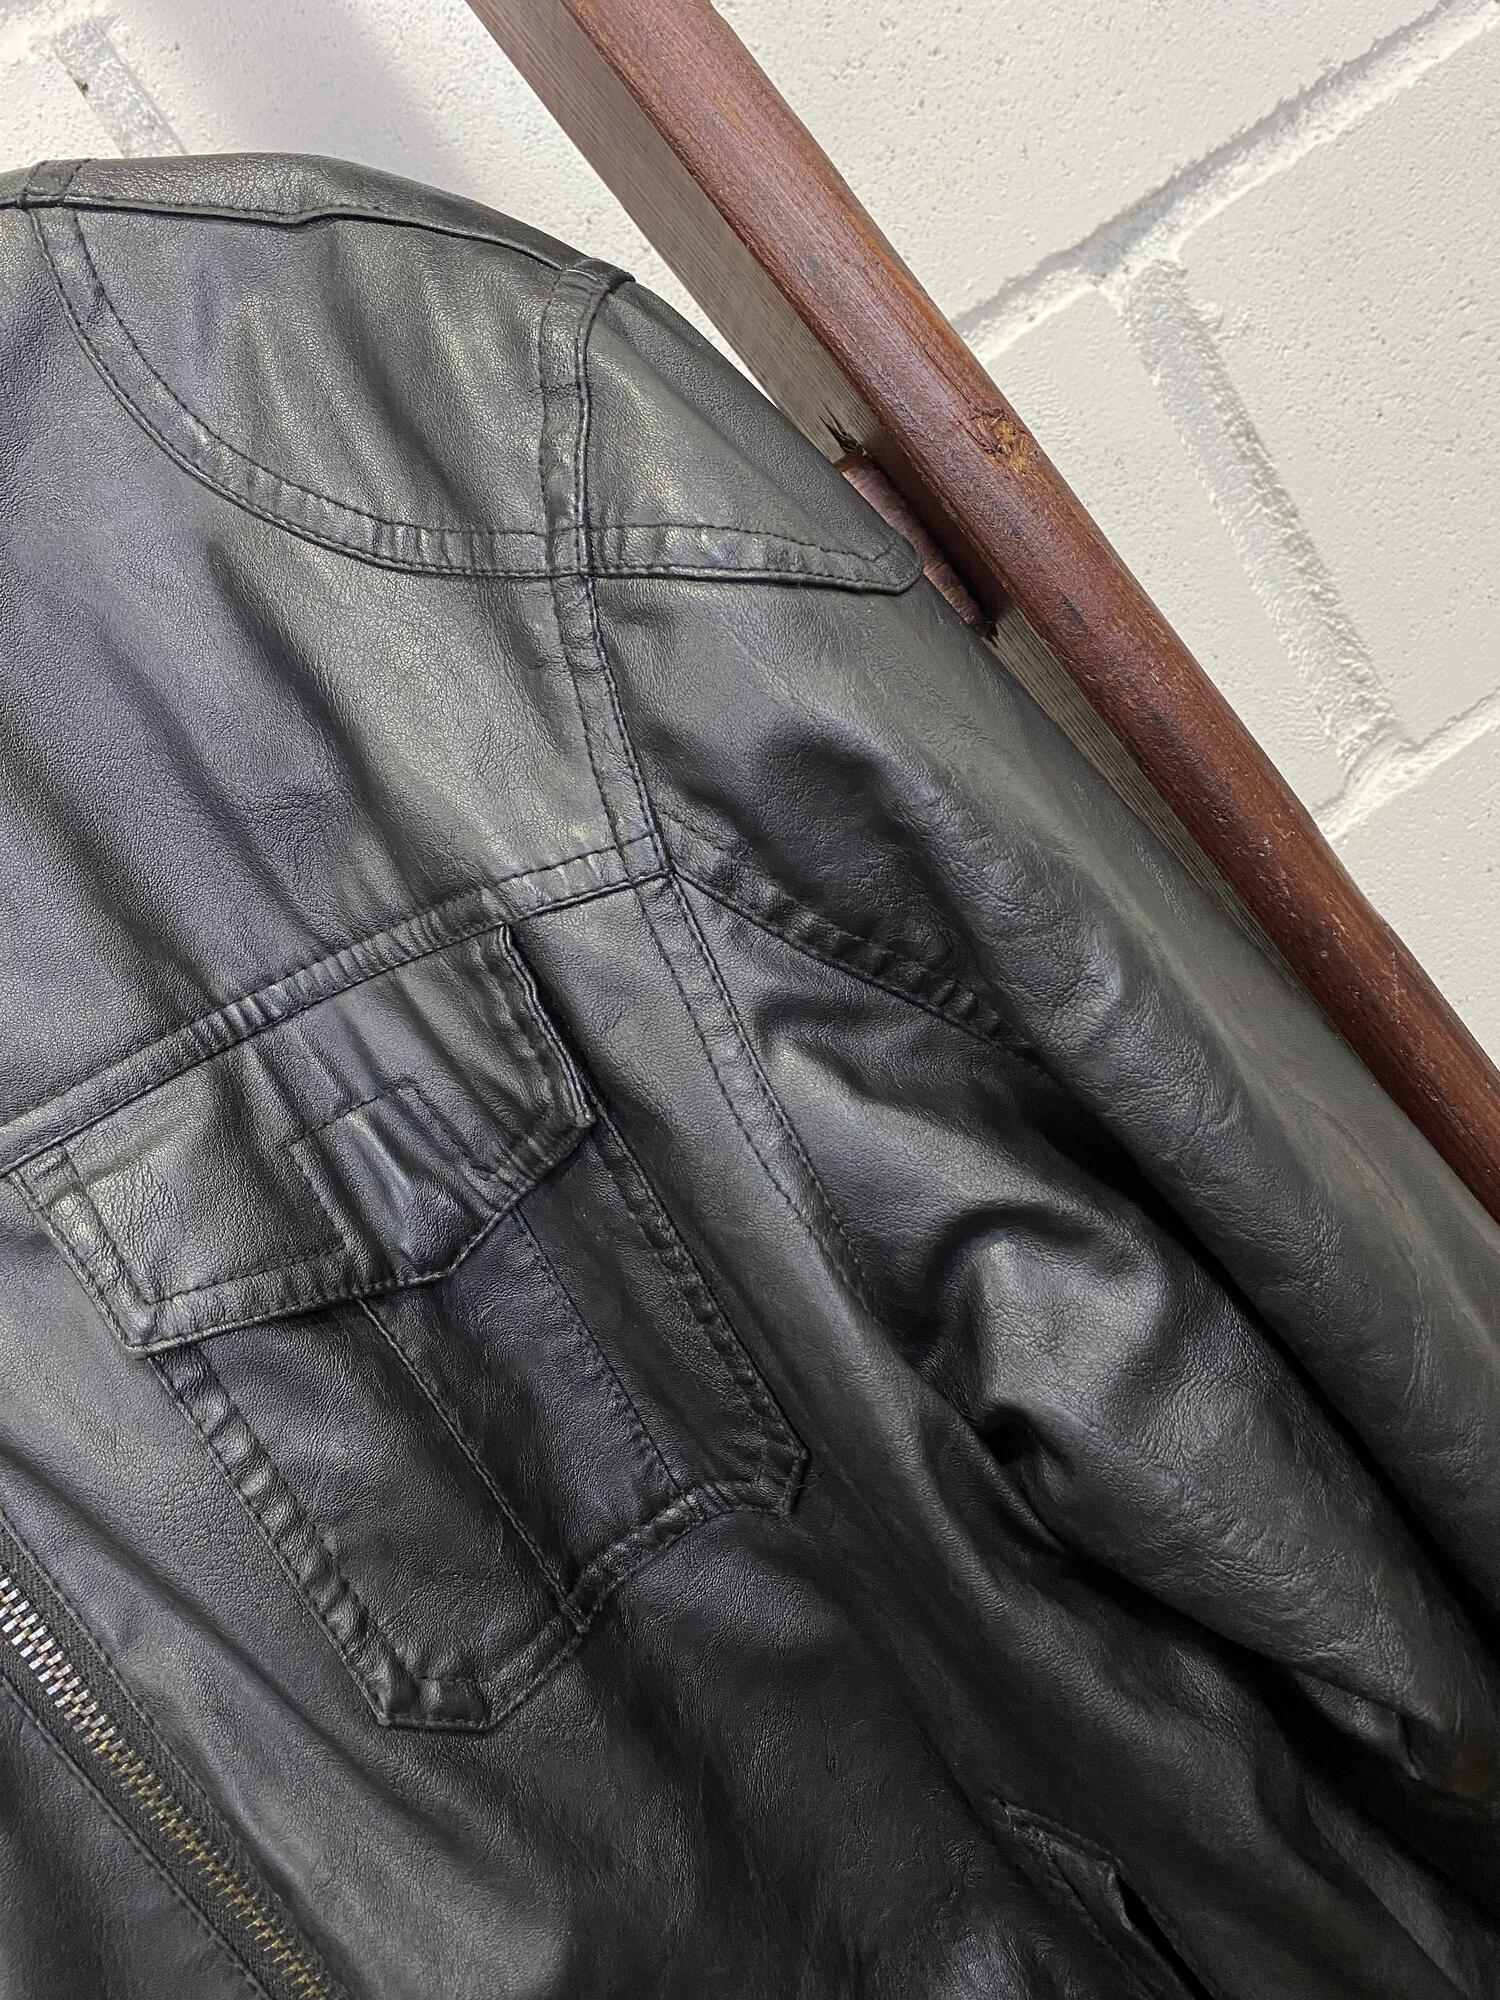 Czarna skórzana kurtka ALTERED IMAGE - Vintage Store | JestemSlow.pl